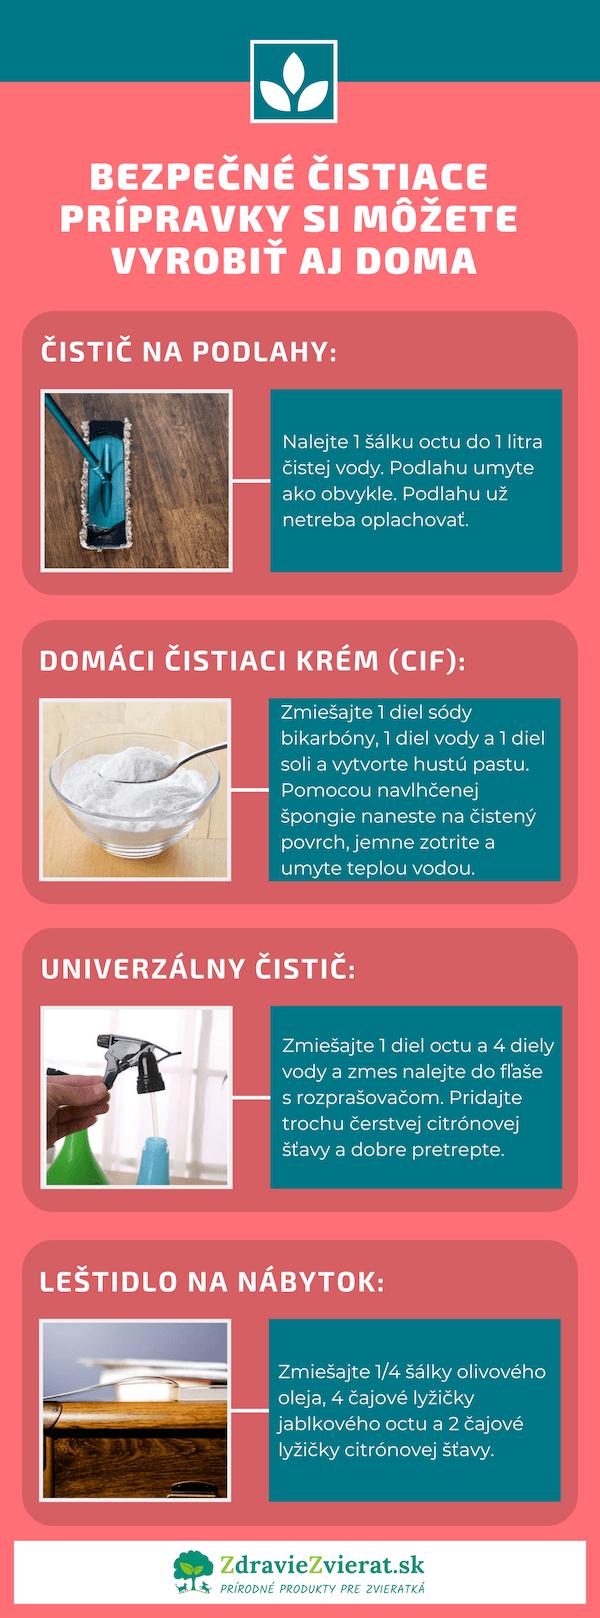 recepty-bezpecne-cistenie@zdraviezvierat.sk